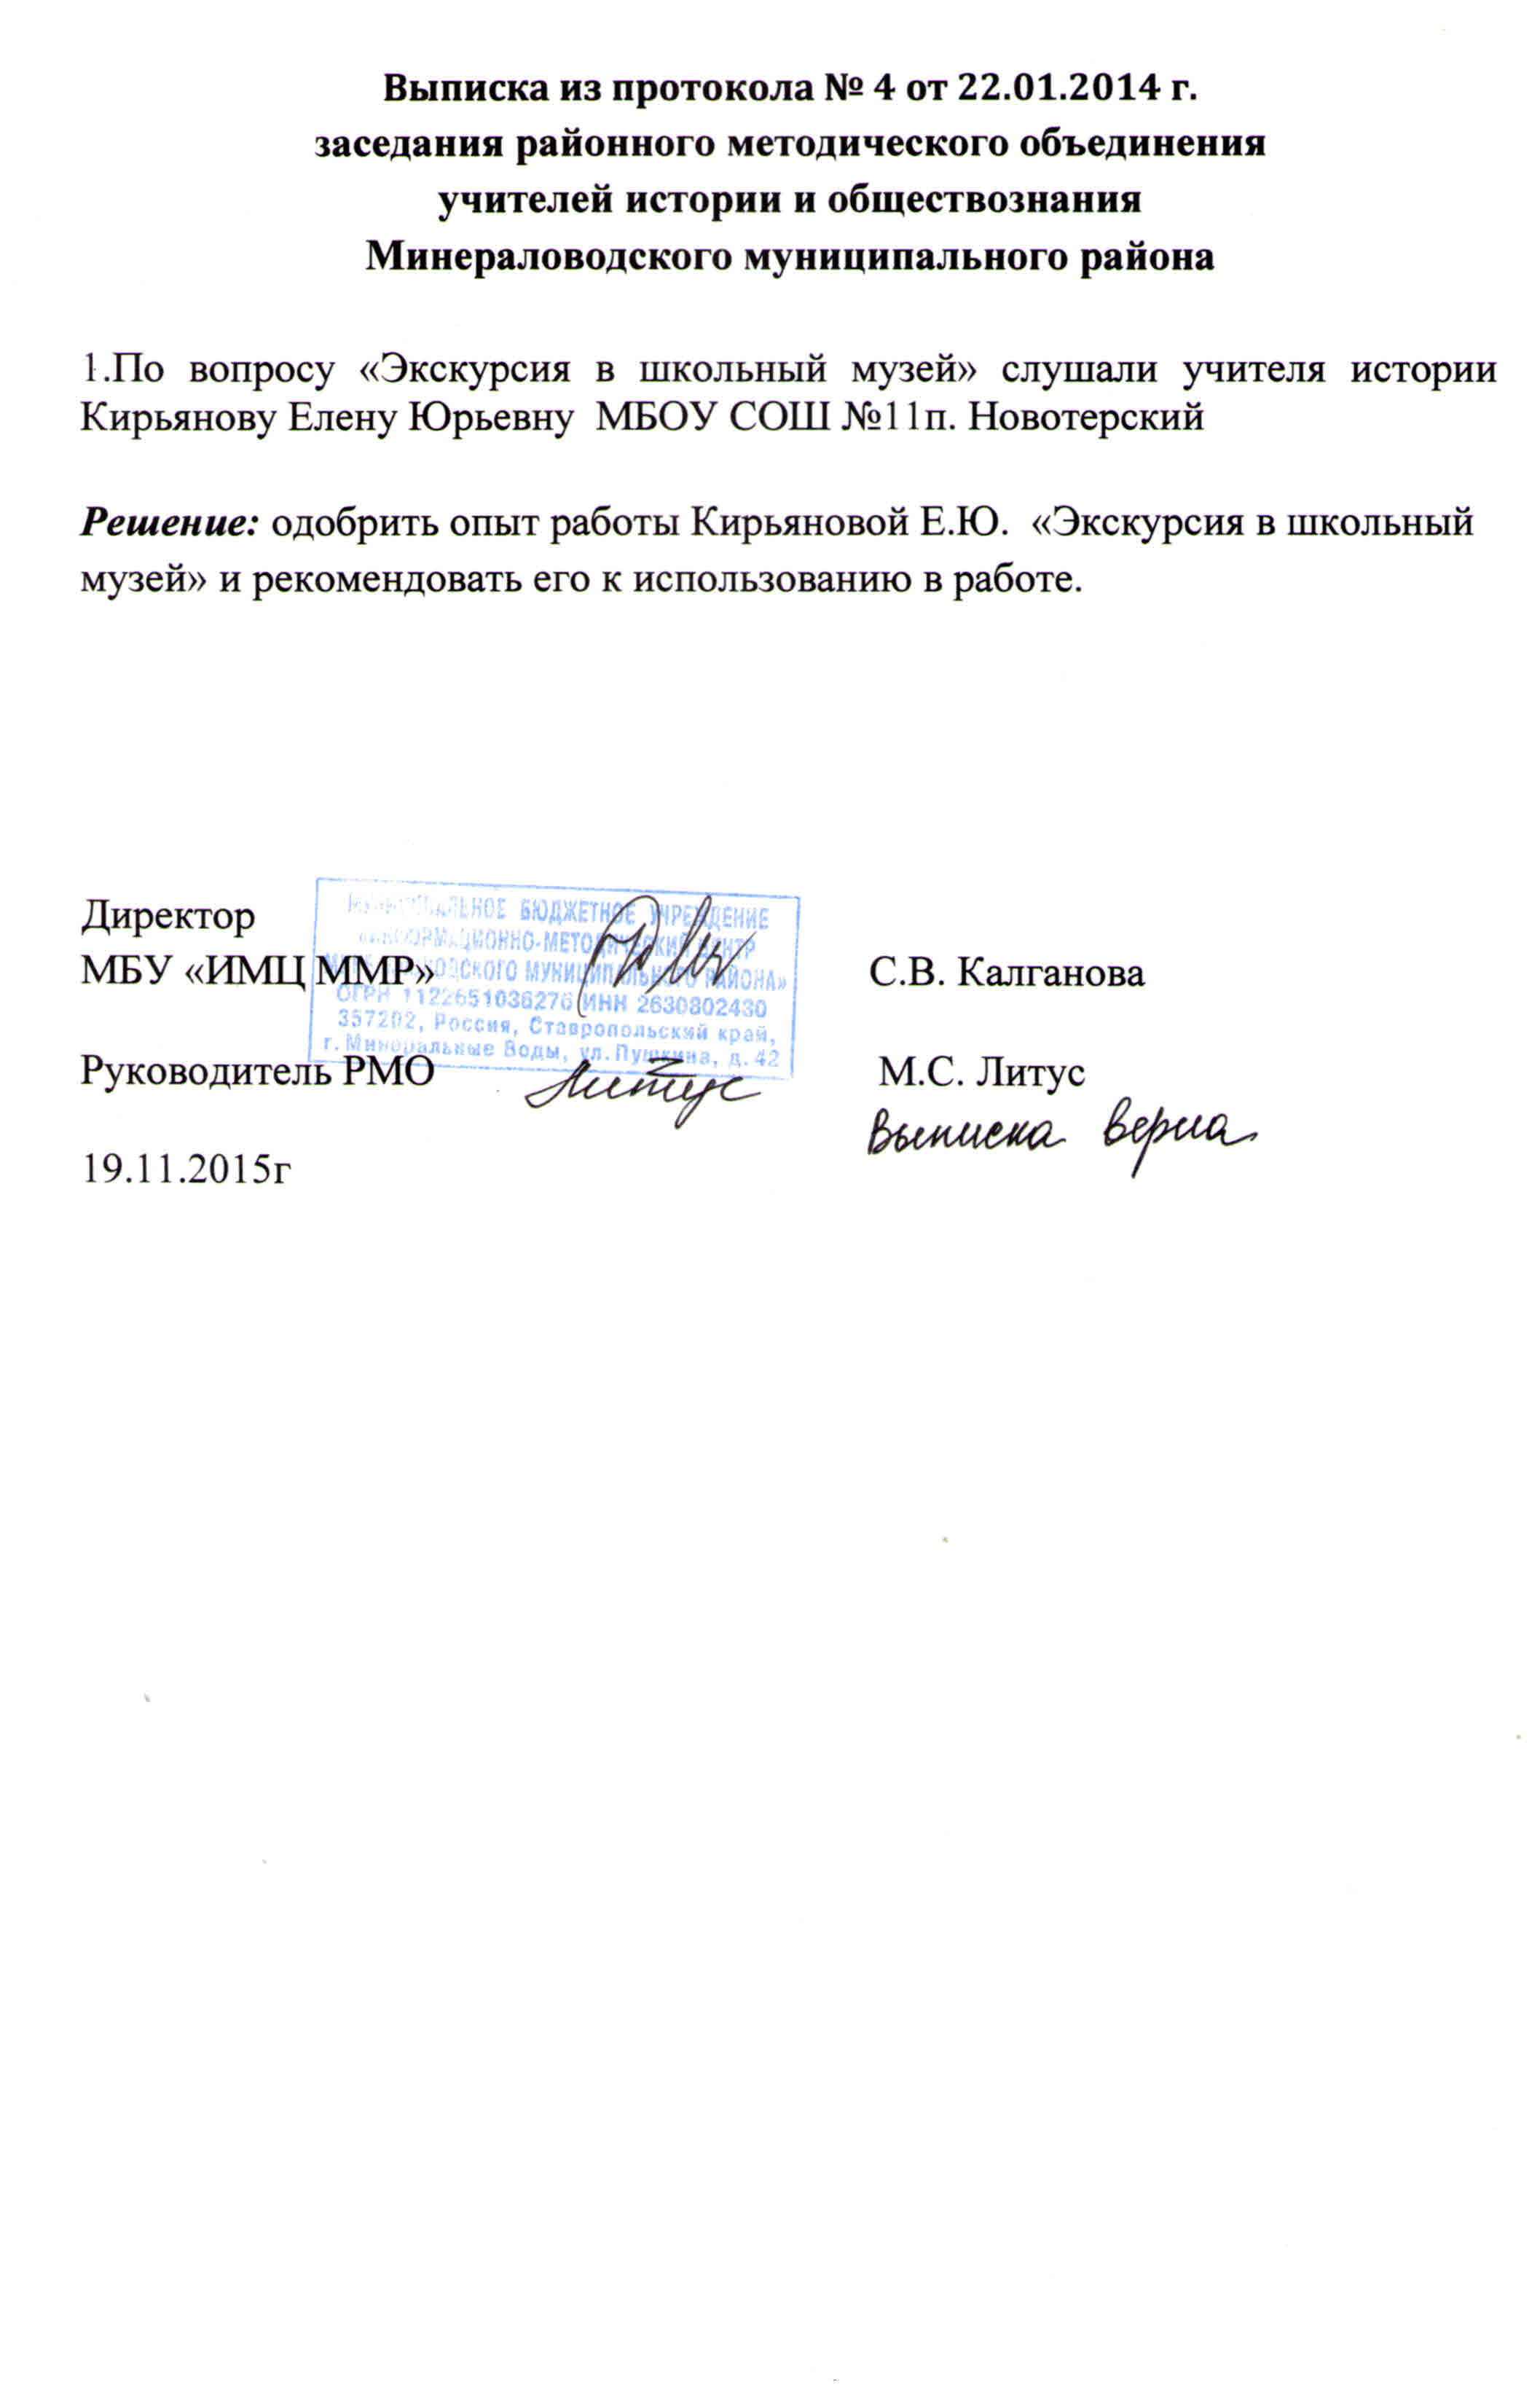 C:\Users\Сергей\Desktop\рмо\Document_4.jpg